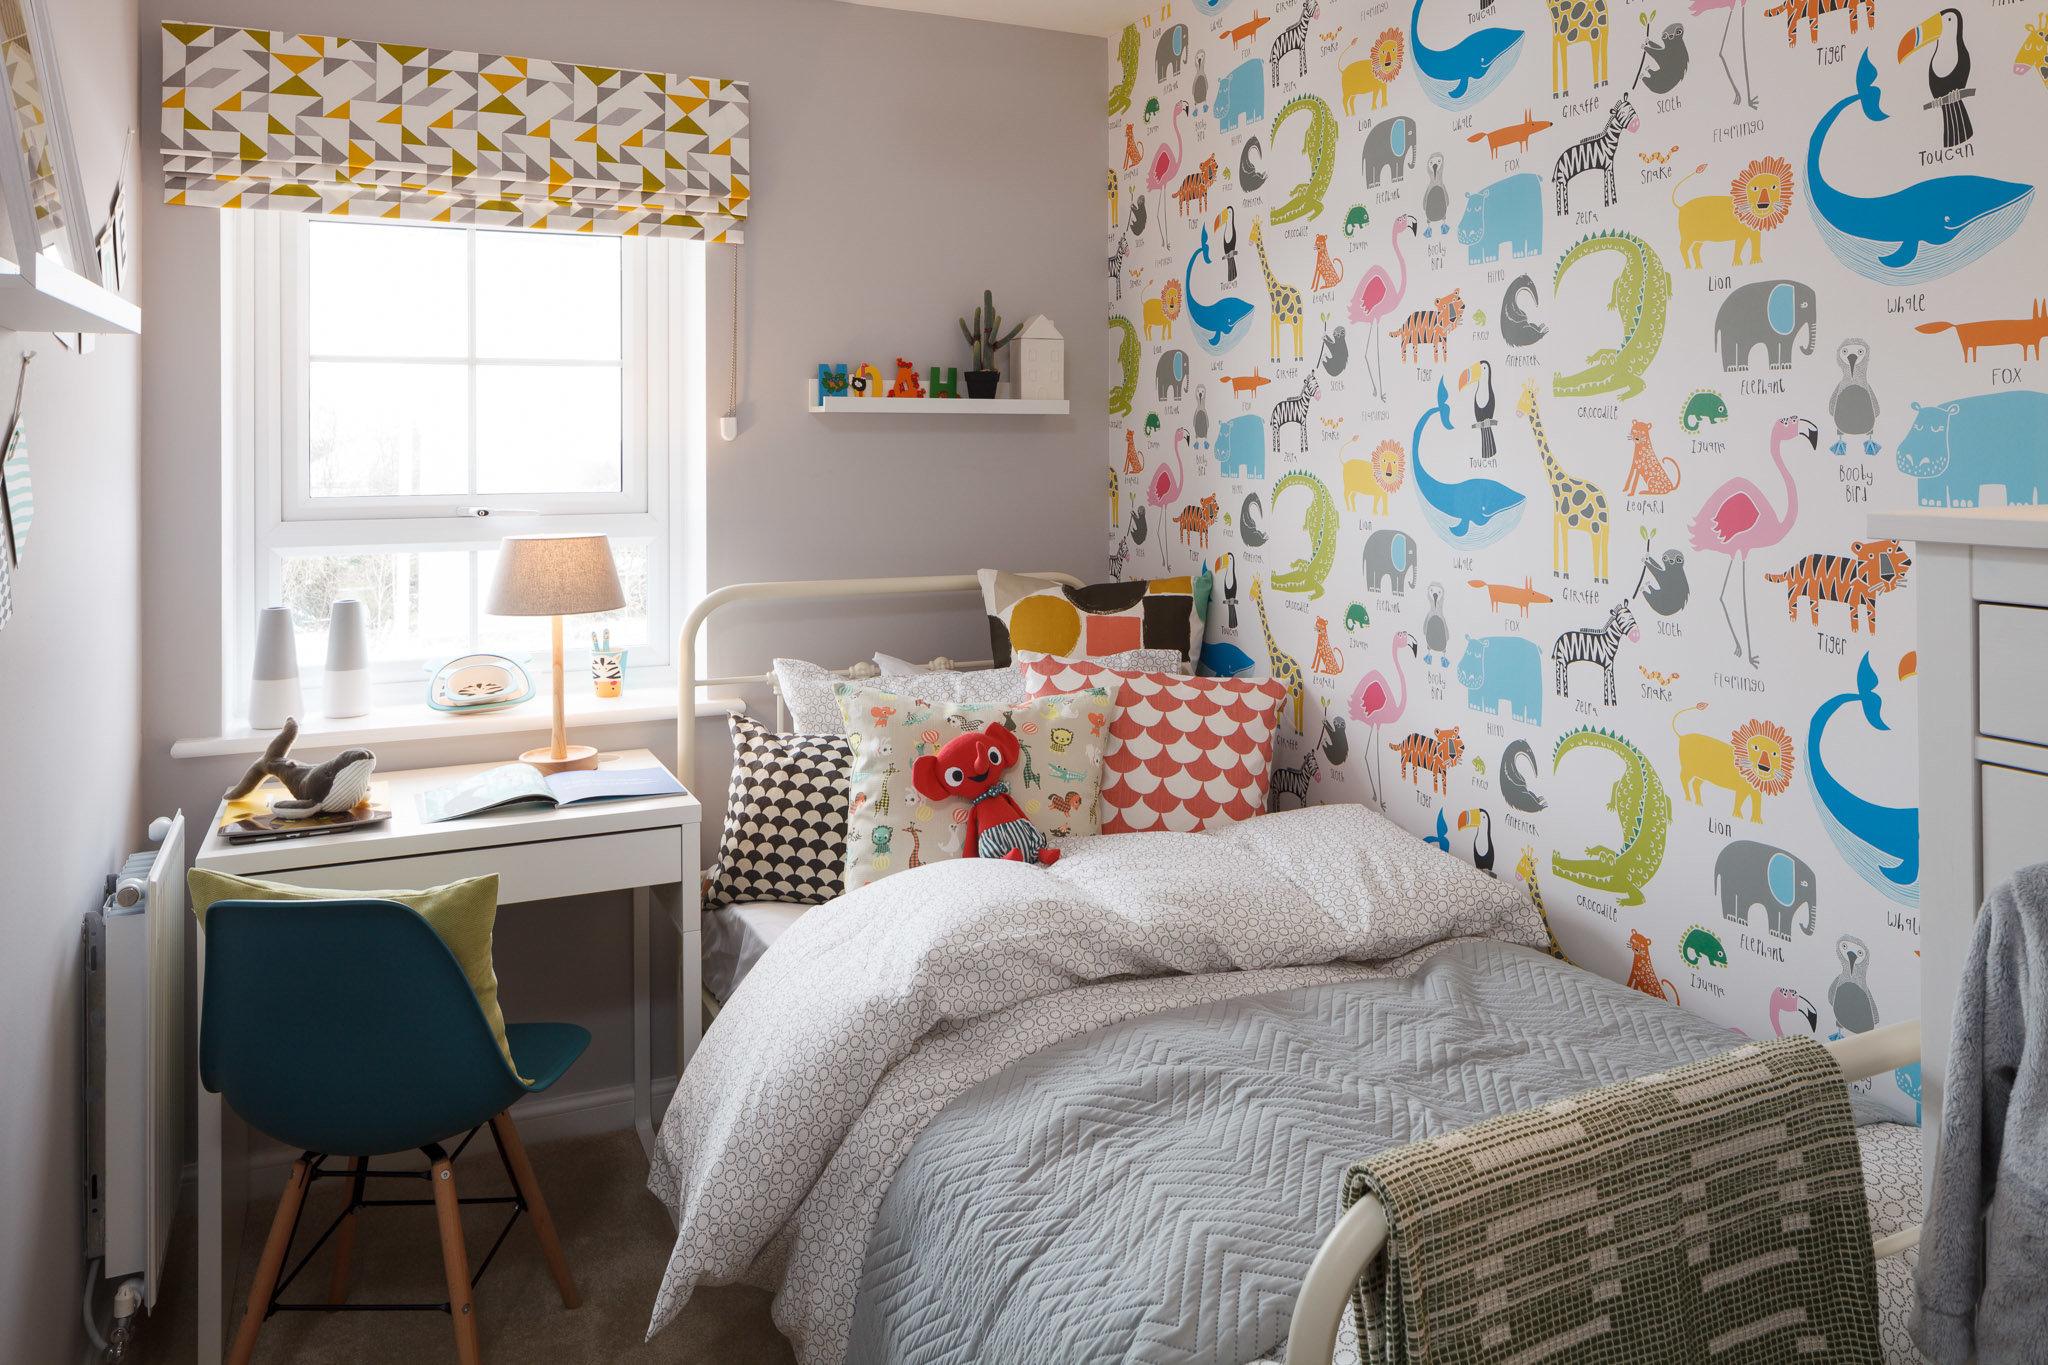 copyright_alex-bland.co.uk_Maidstone_Barratt City Heights_18-03-18_5935.jpg